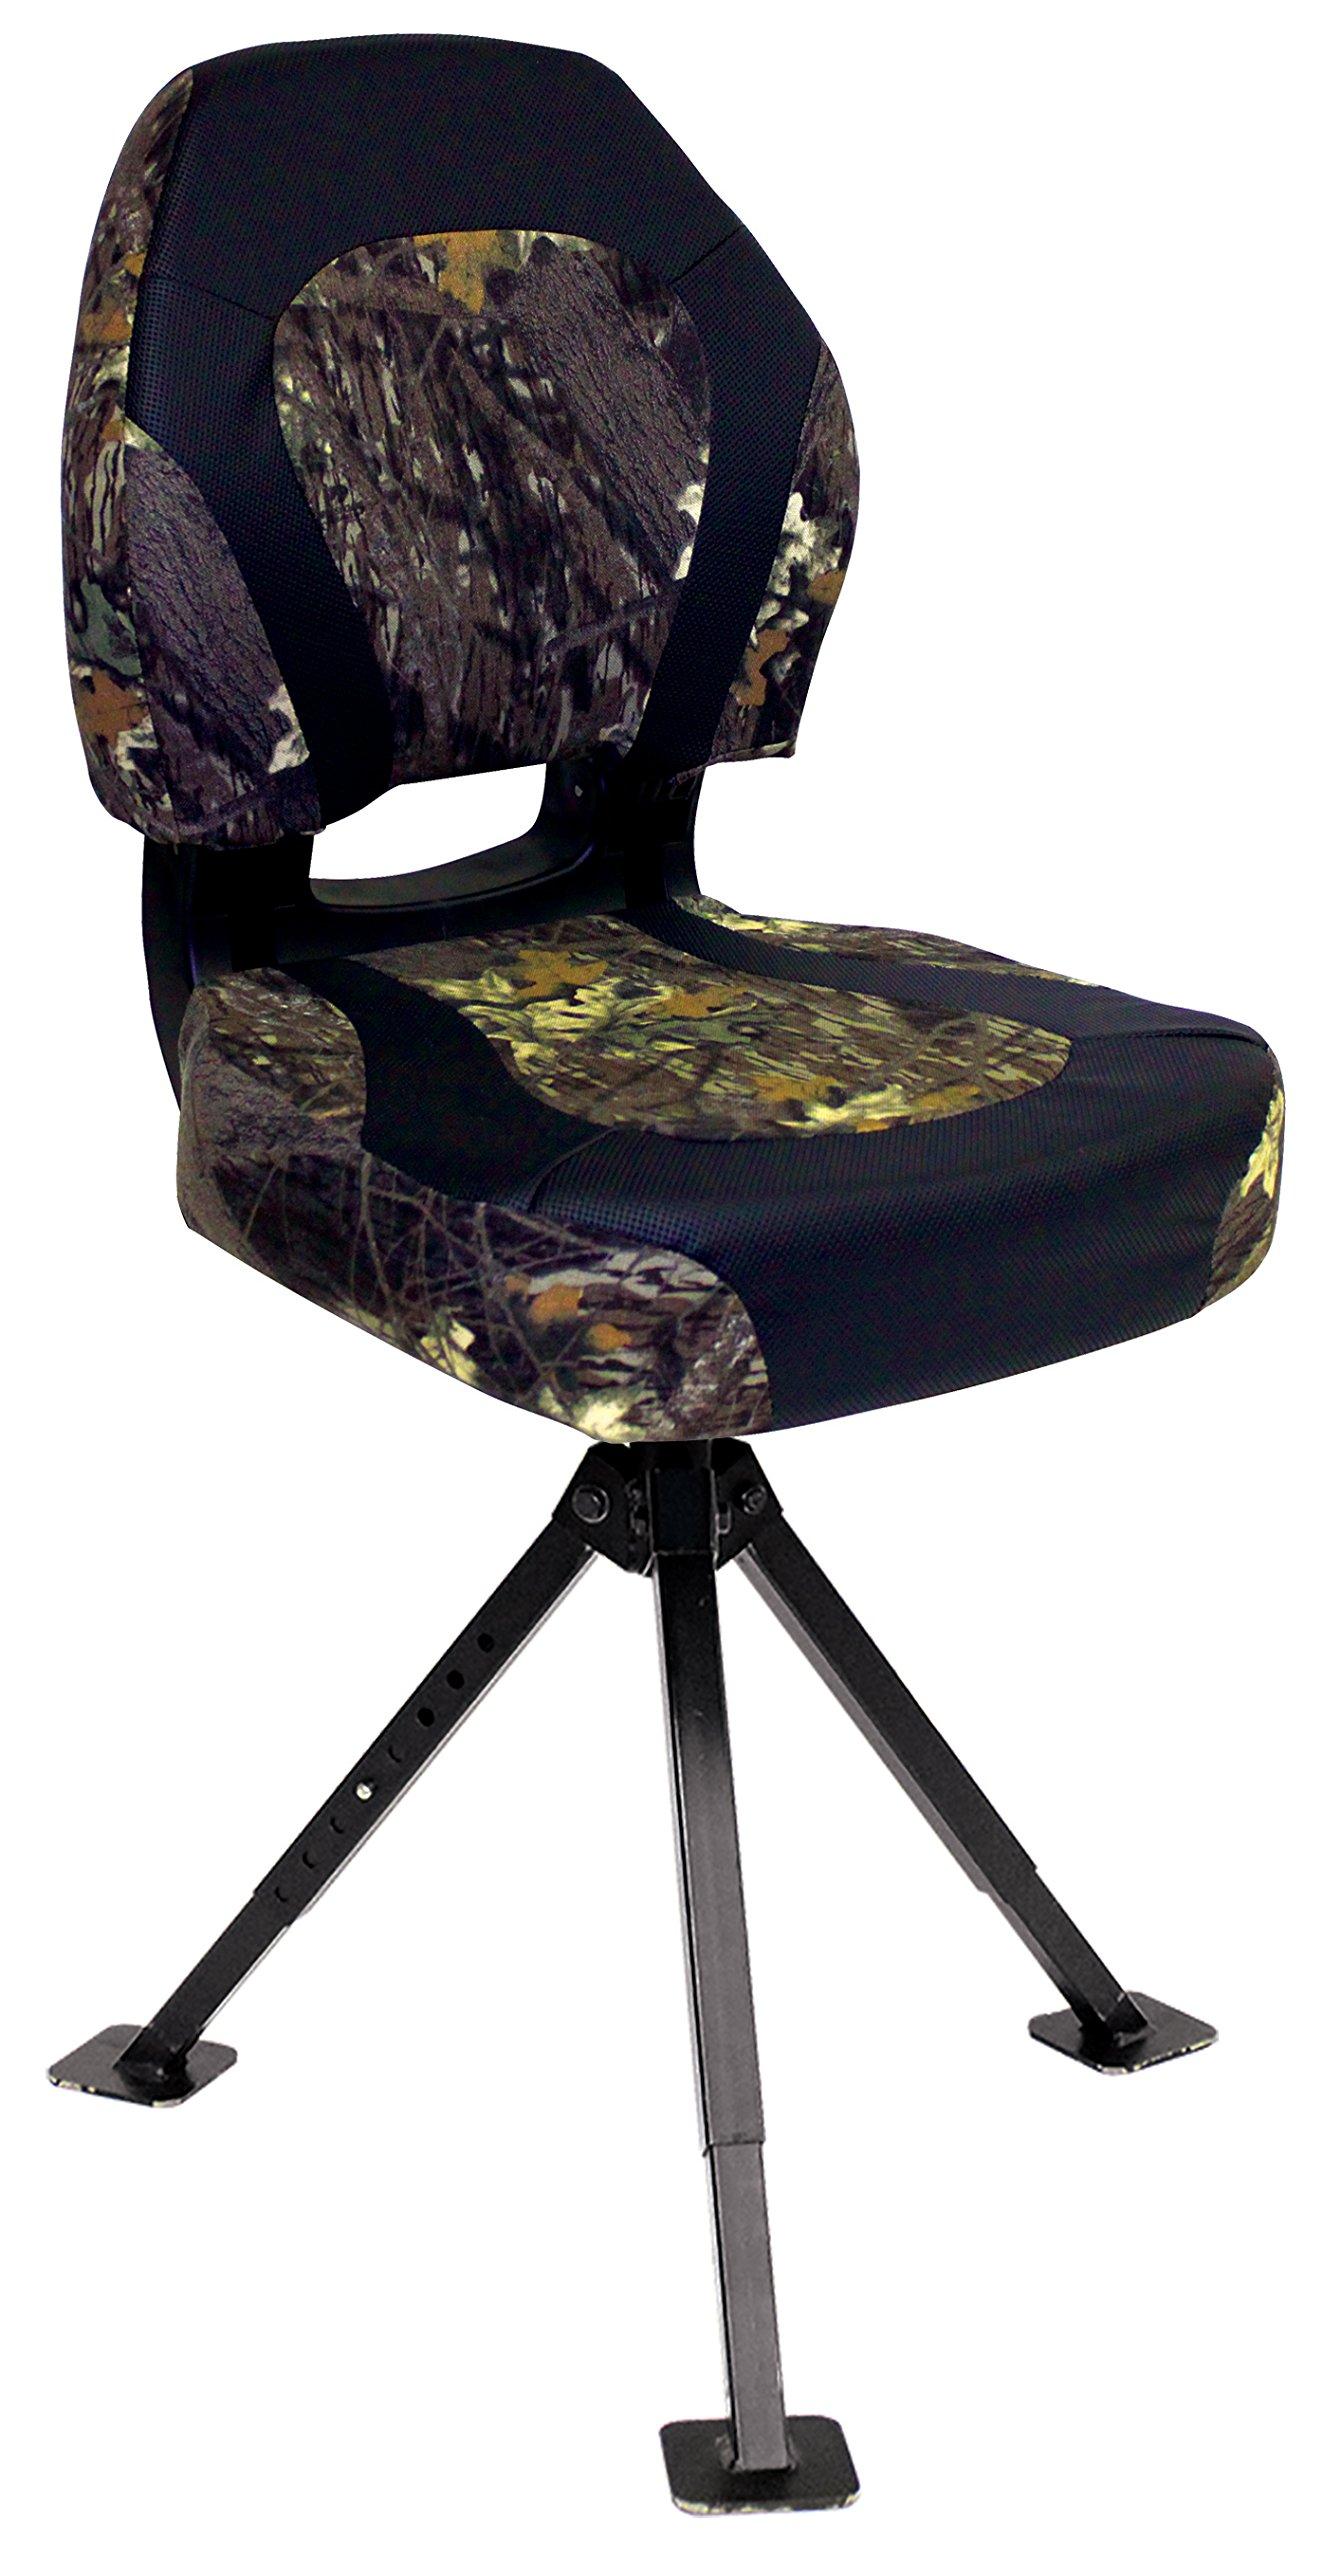 Wise Trailhawk Seat with Tripod 360 Stand, Mossy Oak Break-Up Camo